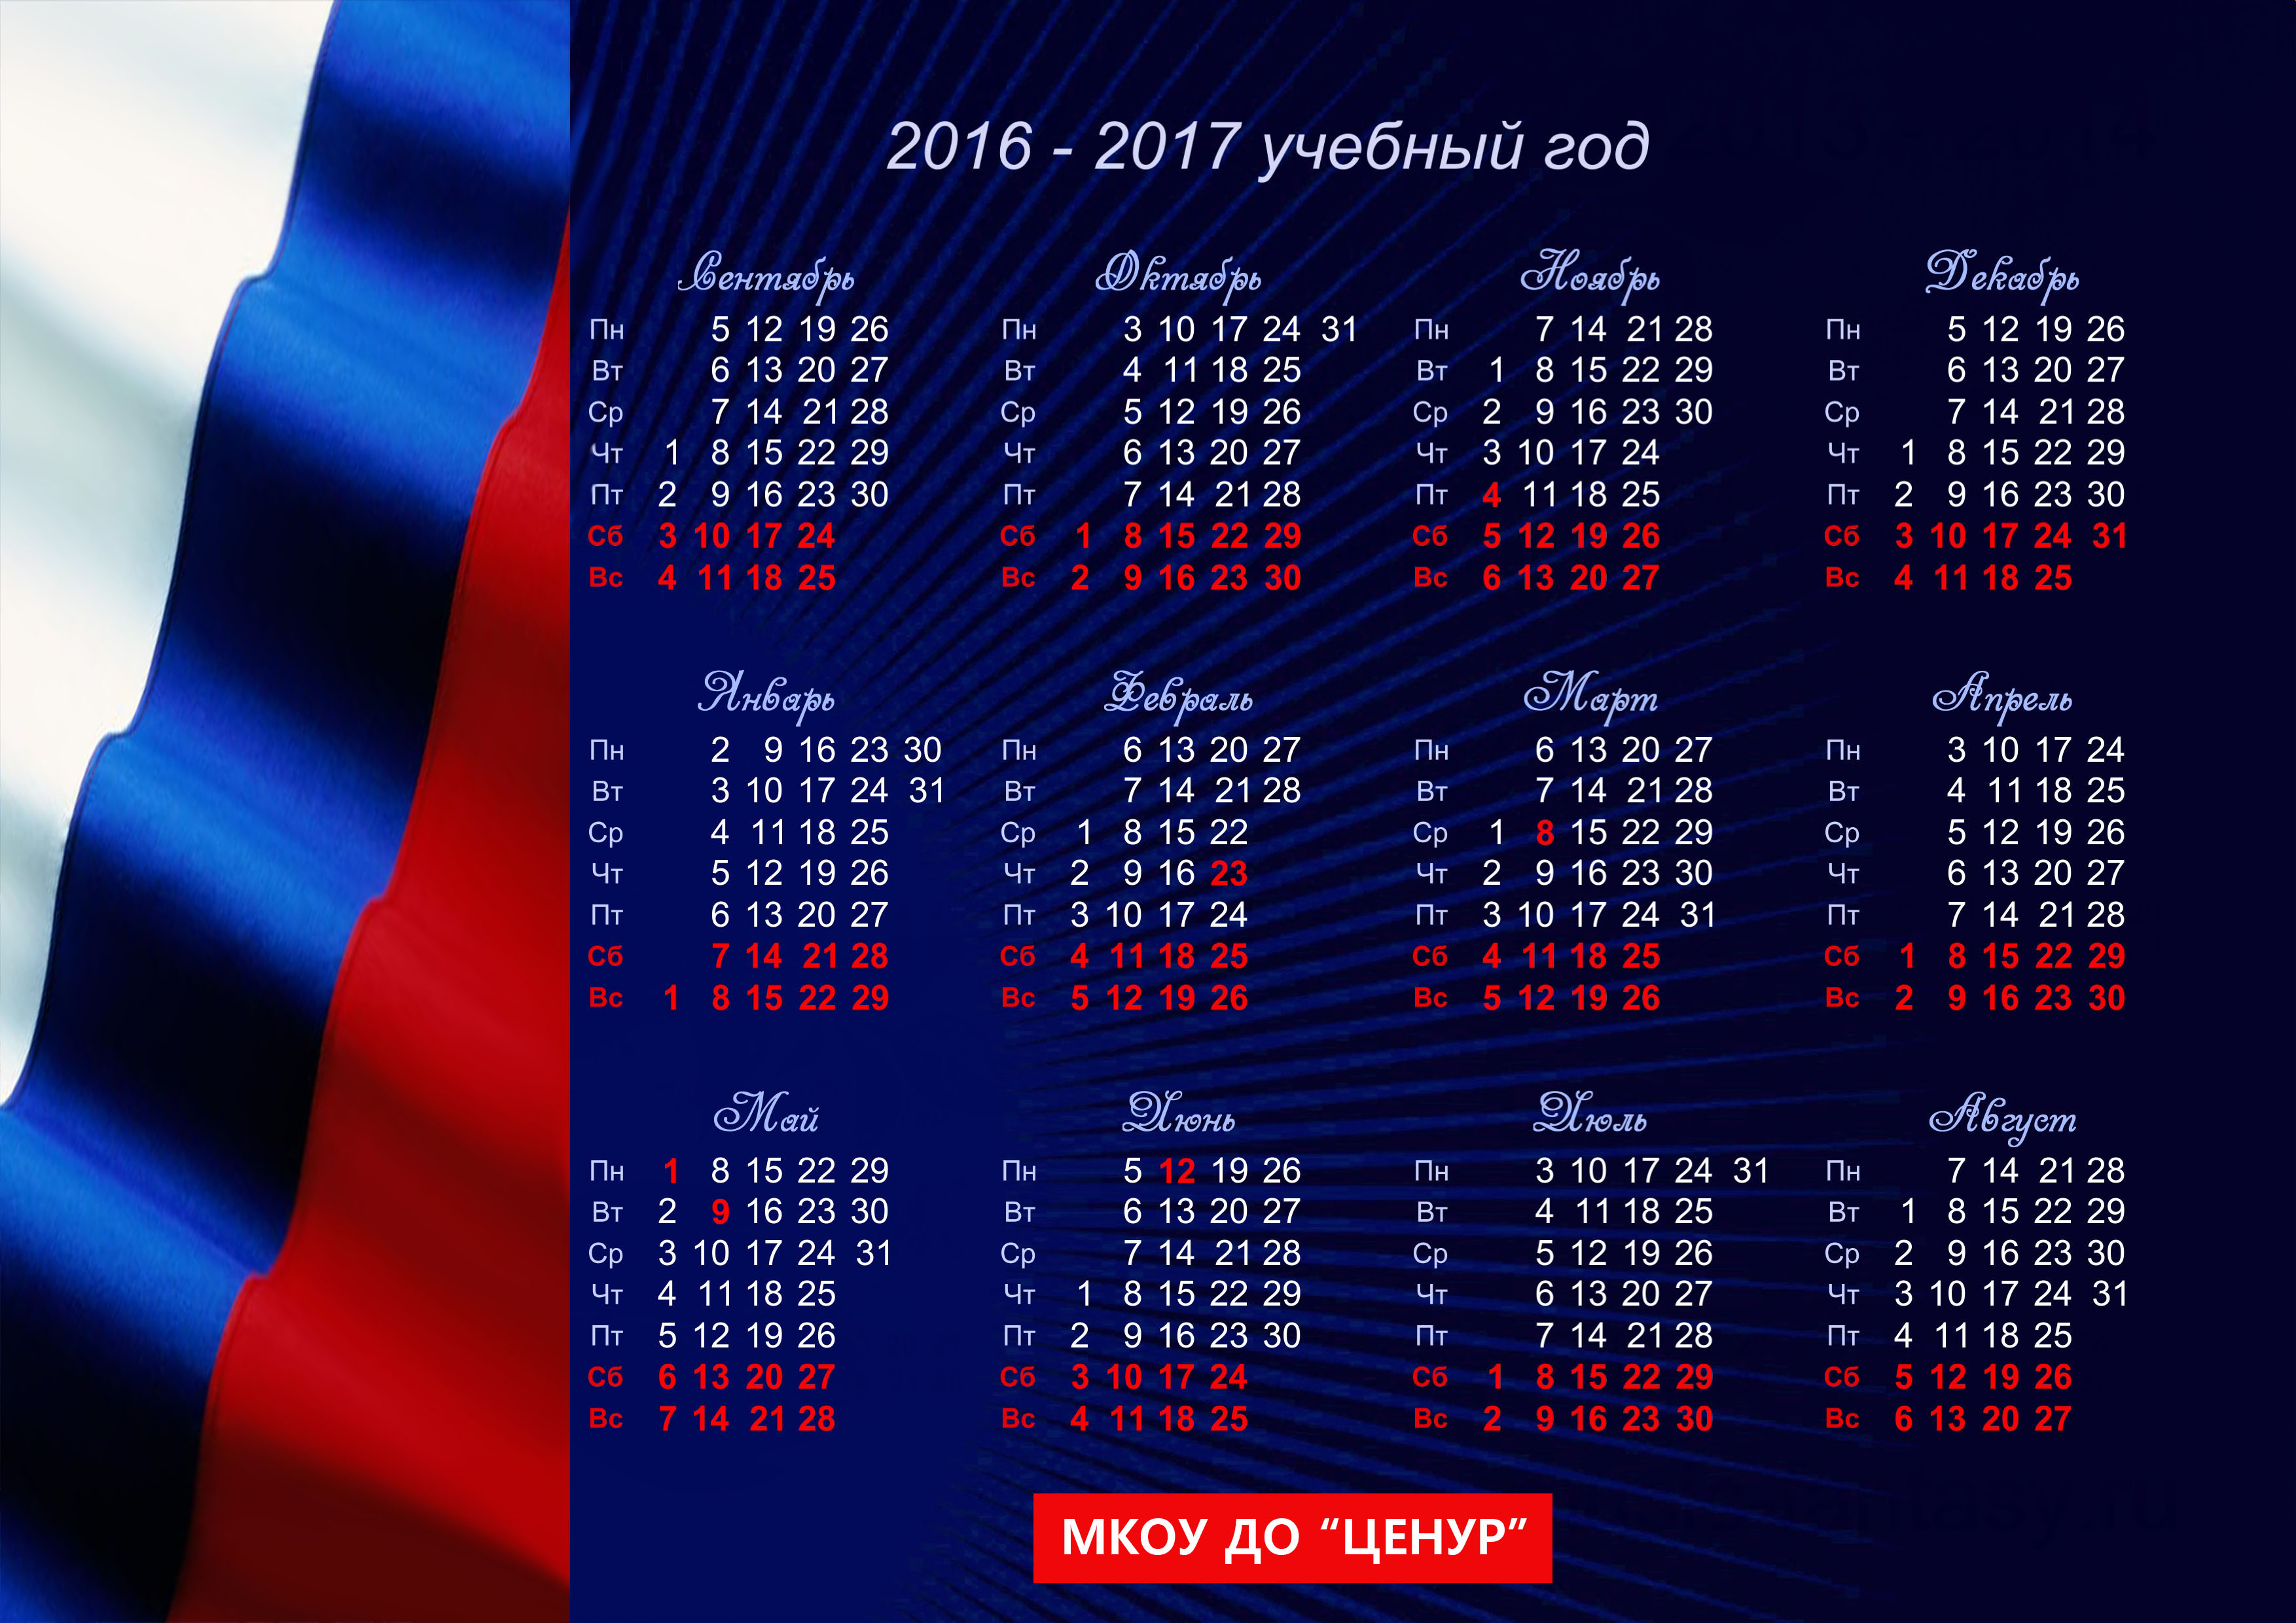 2016-2017-uch-god-var-00